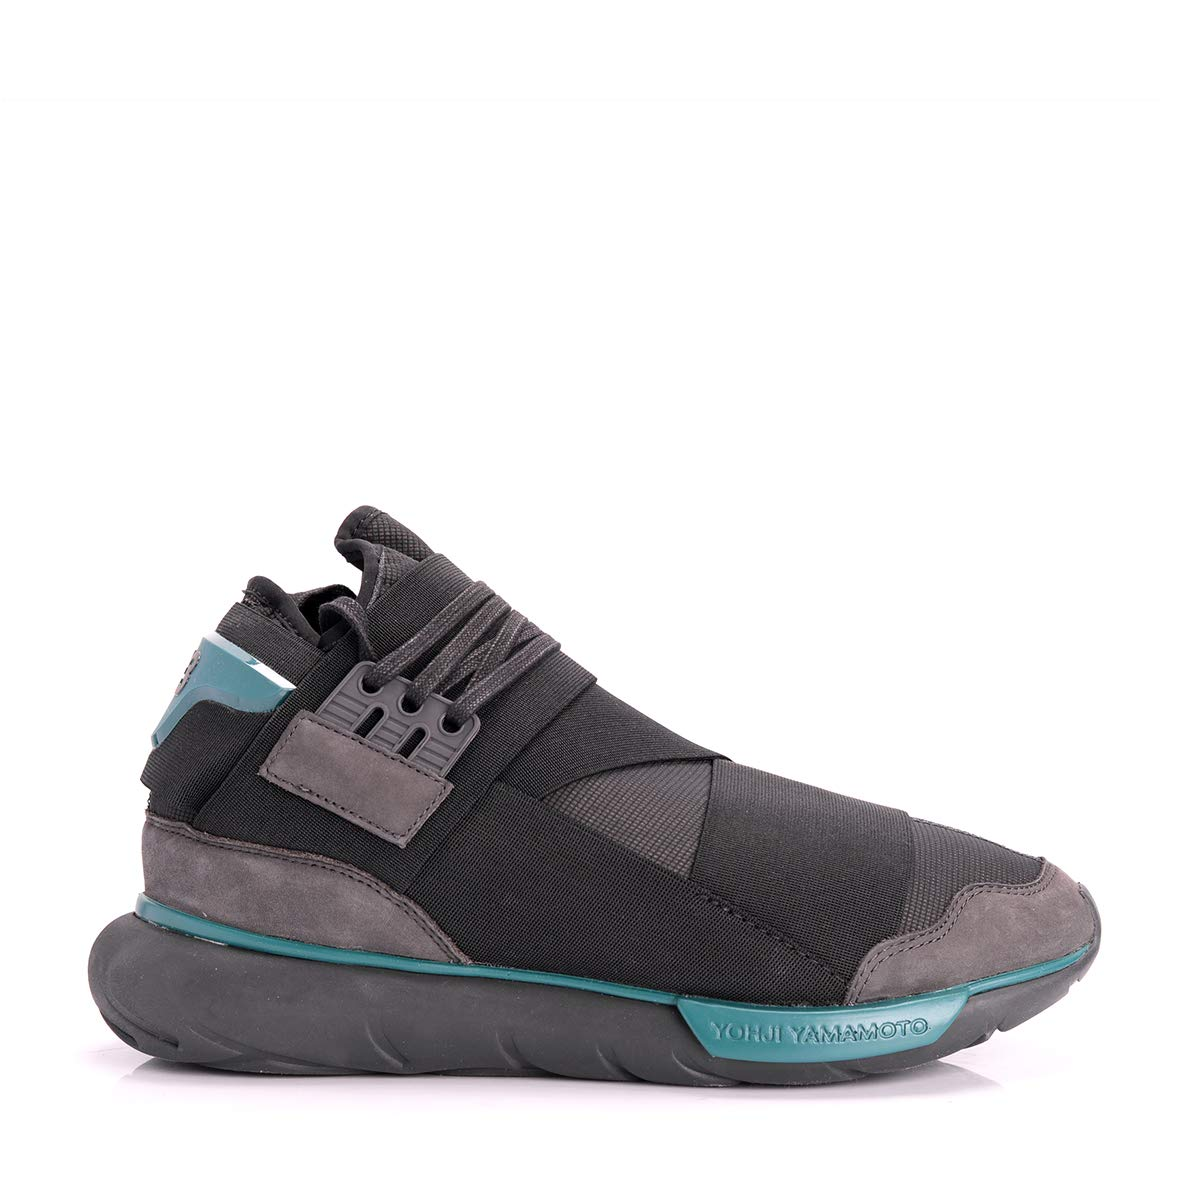 1d9f4591e ... Y-3 Qasa High Chamel Grey 9 Amazon.co.uk Clothing  Adidas Y-3 Yohji  Yamamoto Qasa High Chamel ...